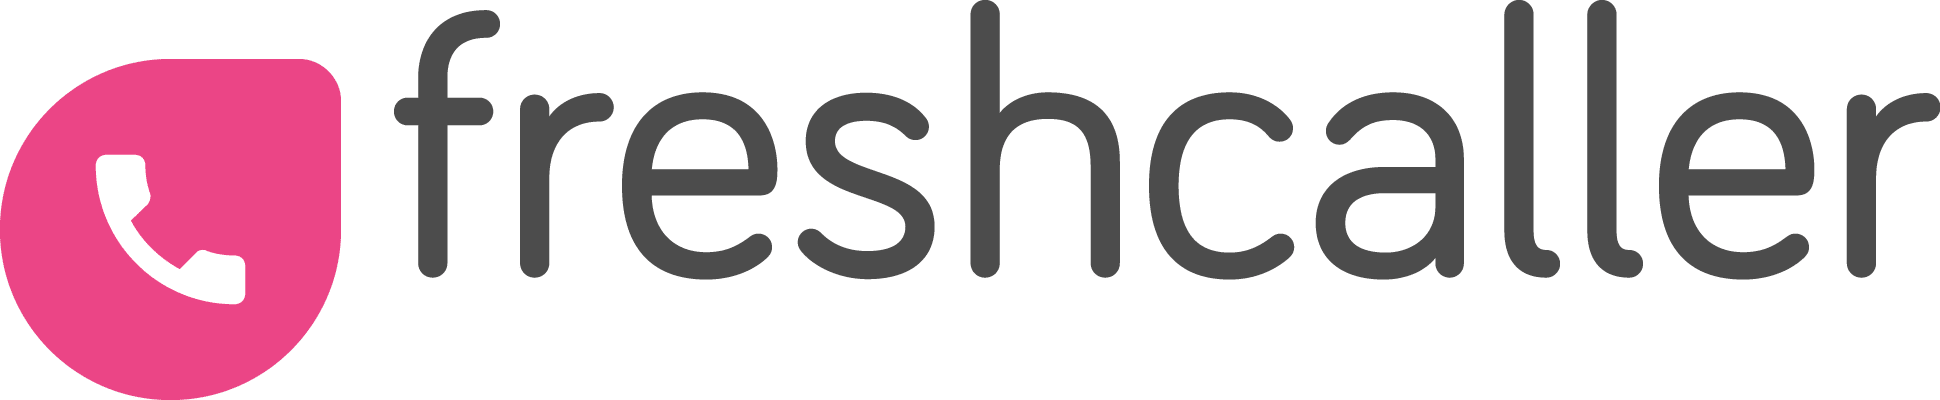 Freshcaller Coupon & Startup Discount